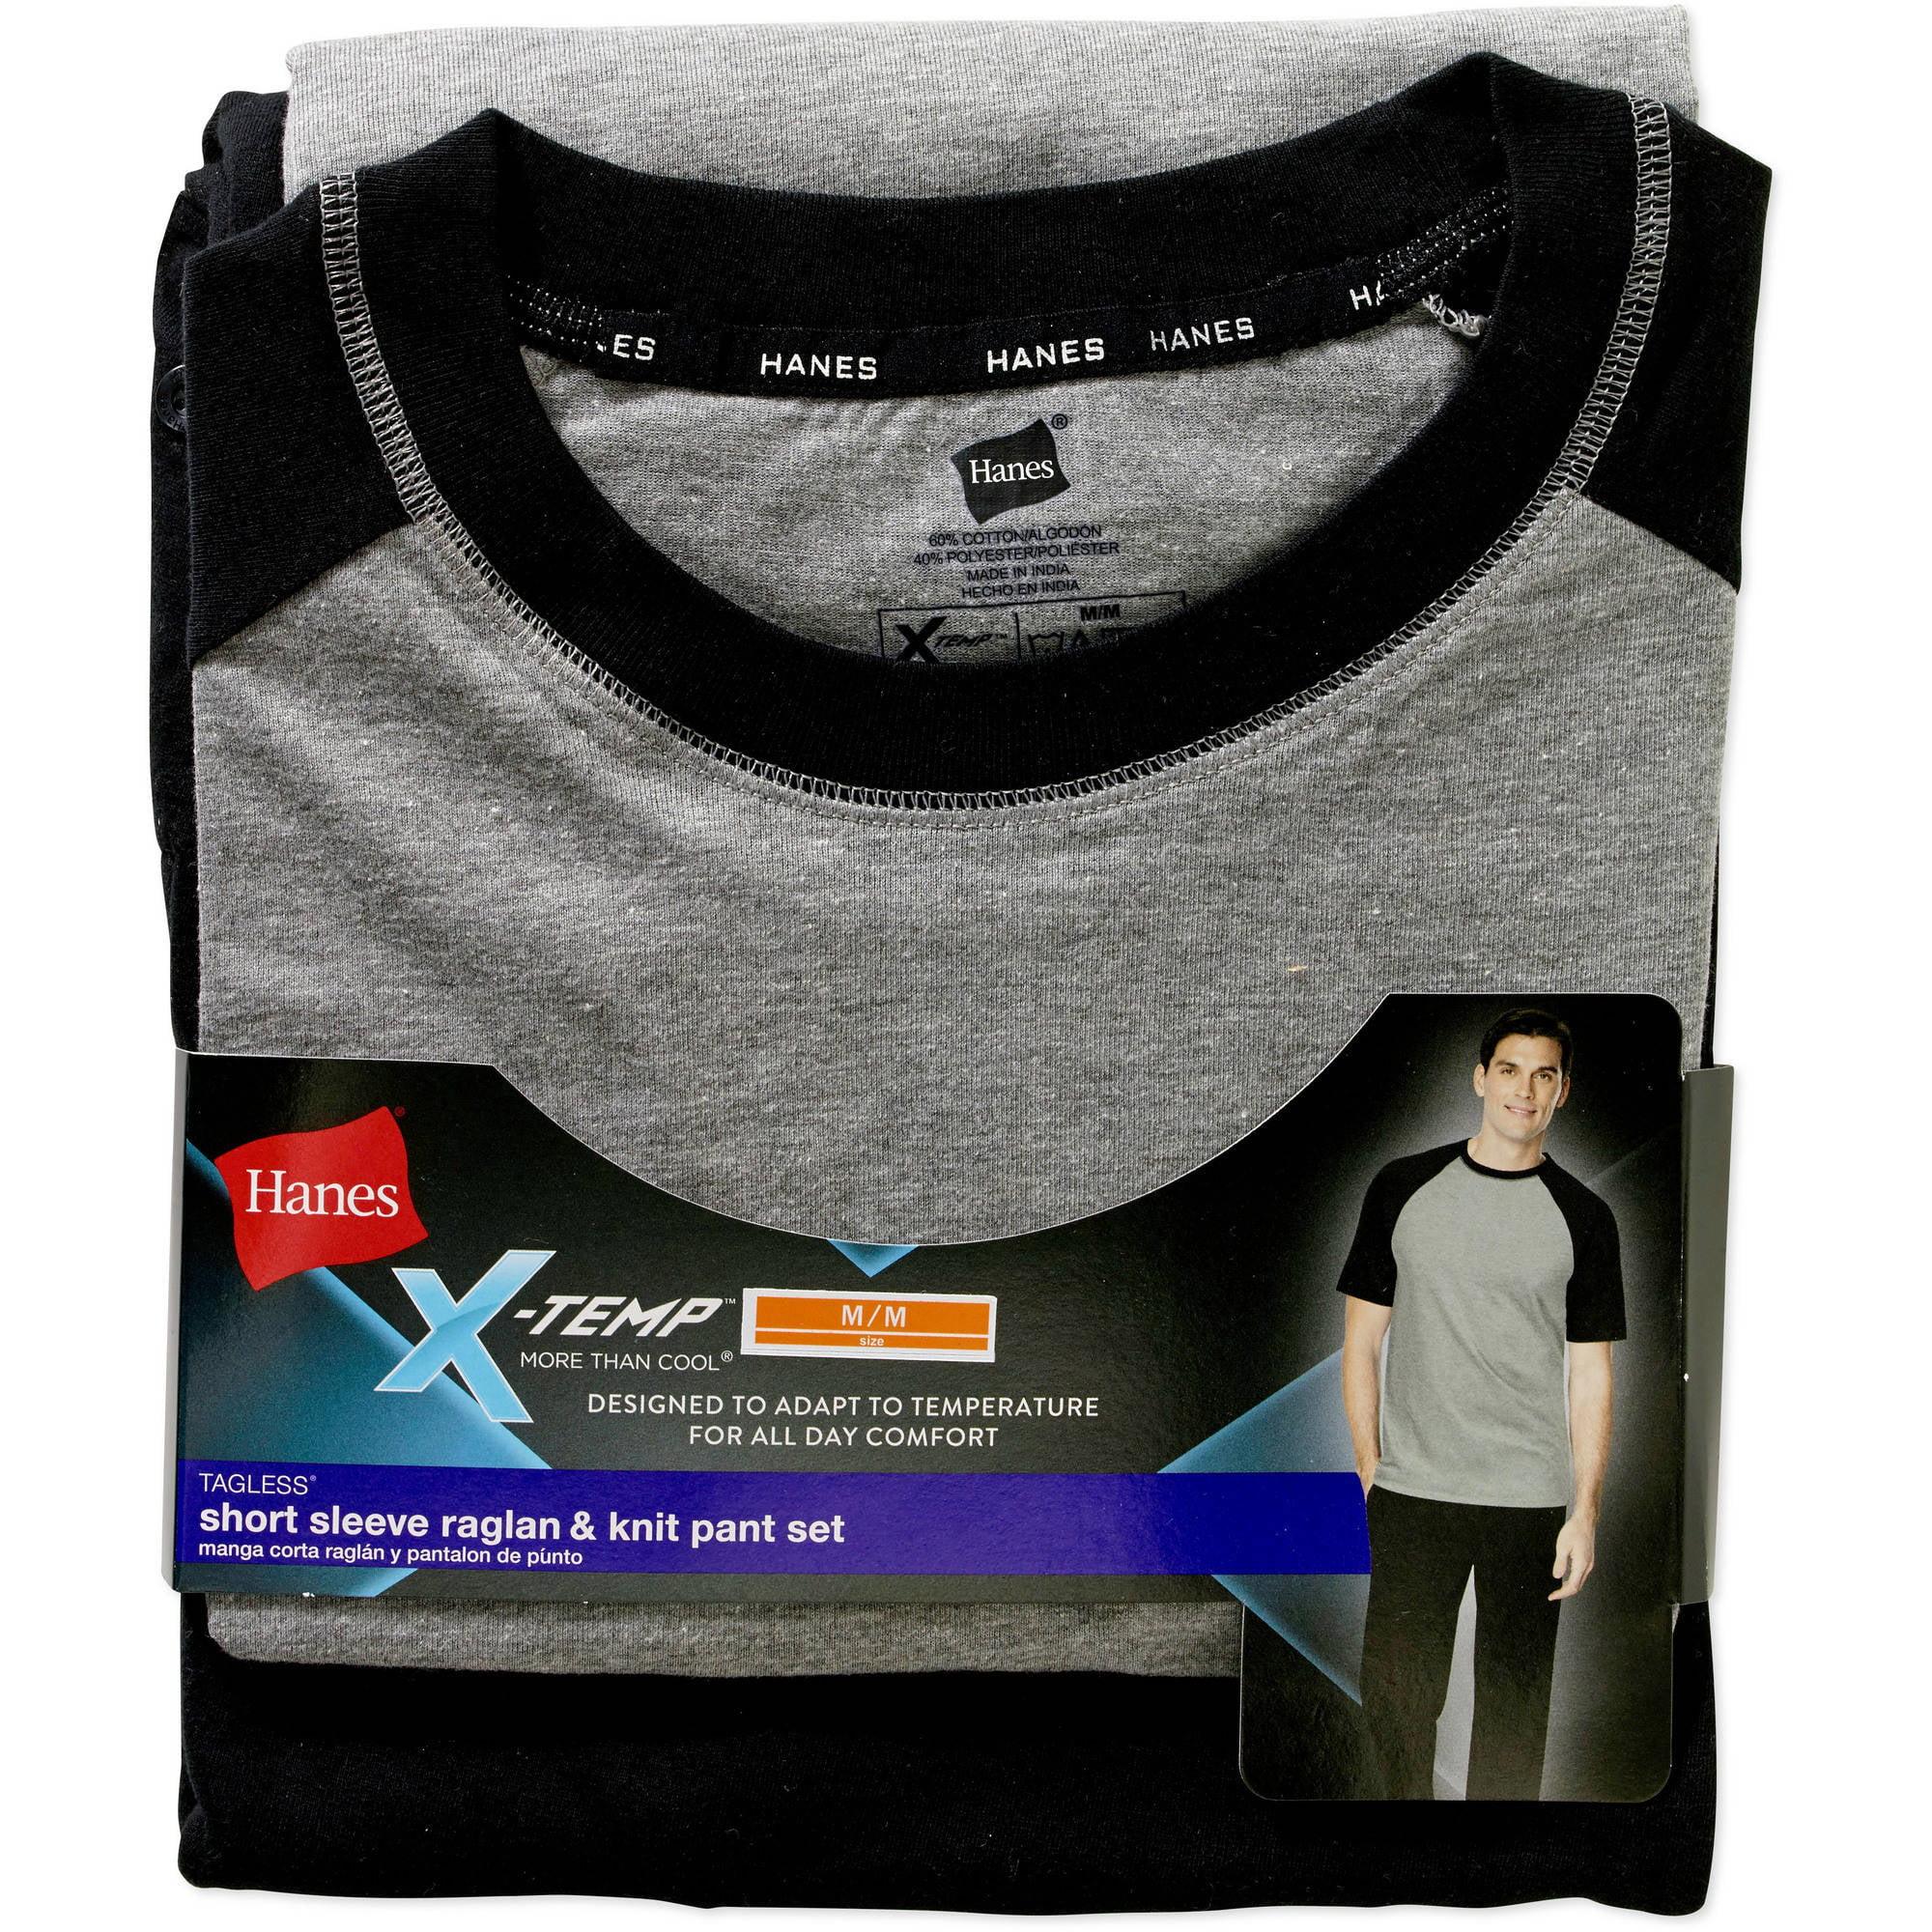 Hanes Men's X-Temp Short Sleeve Raglan and Knit Pant Set